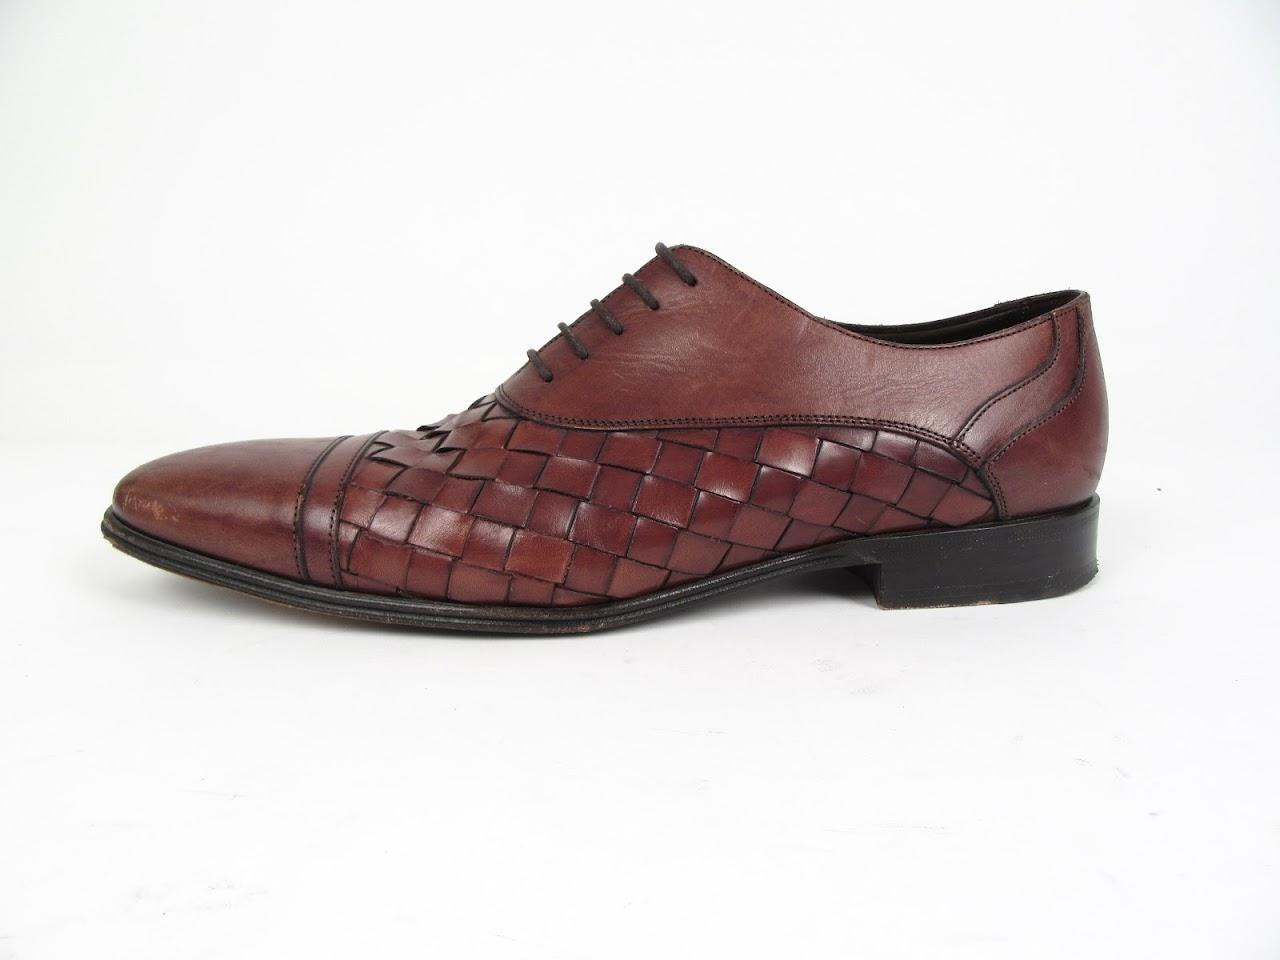 Dolce & Gabbanna Woven Leather Cap Toe Brogue